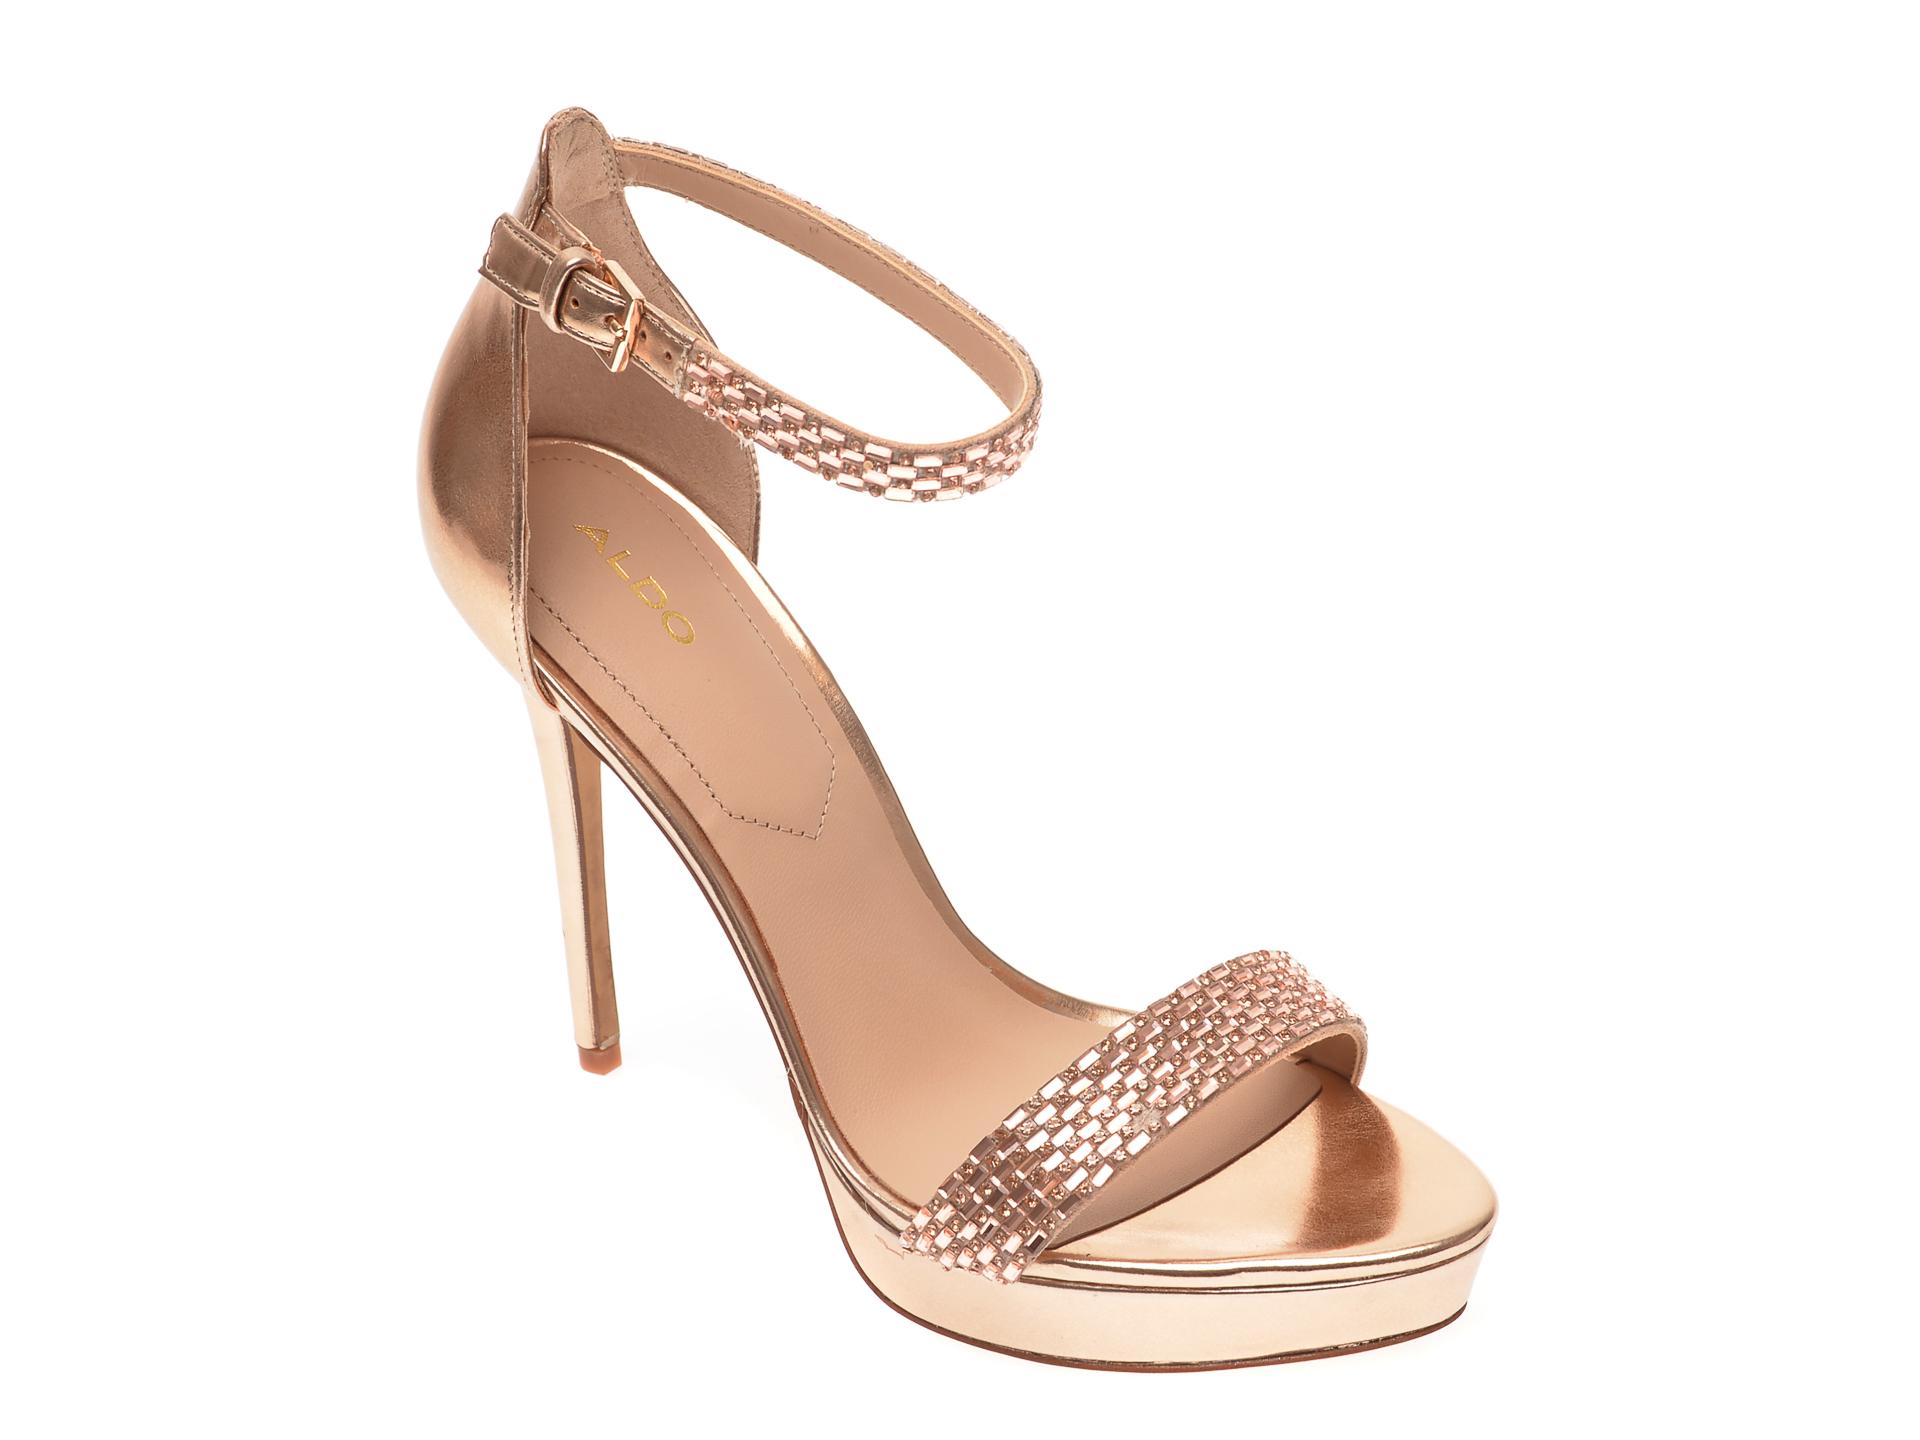 Sandale ALDO aurii, Stunning653, din piele ecologica imagine otter.ro 2021